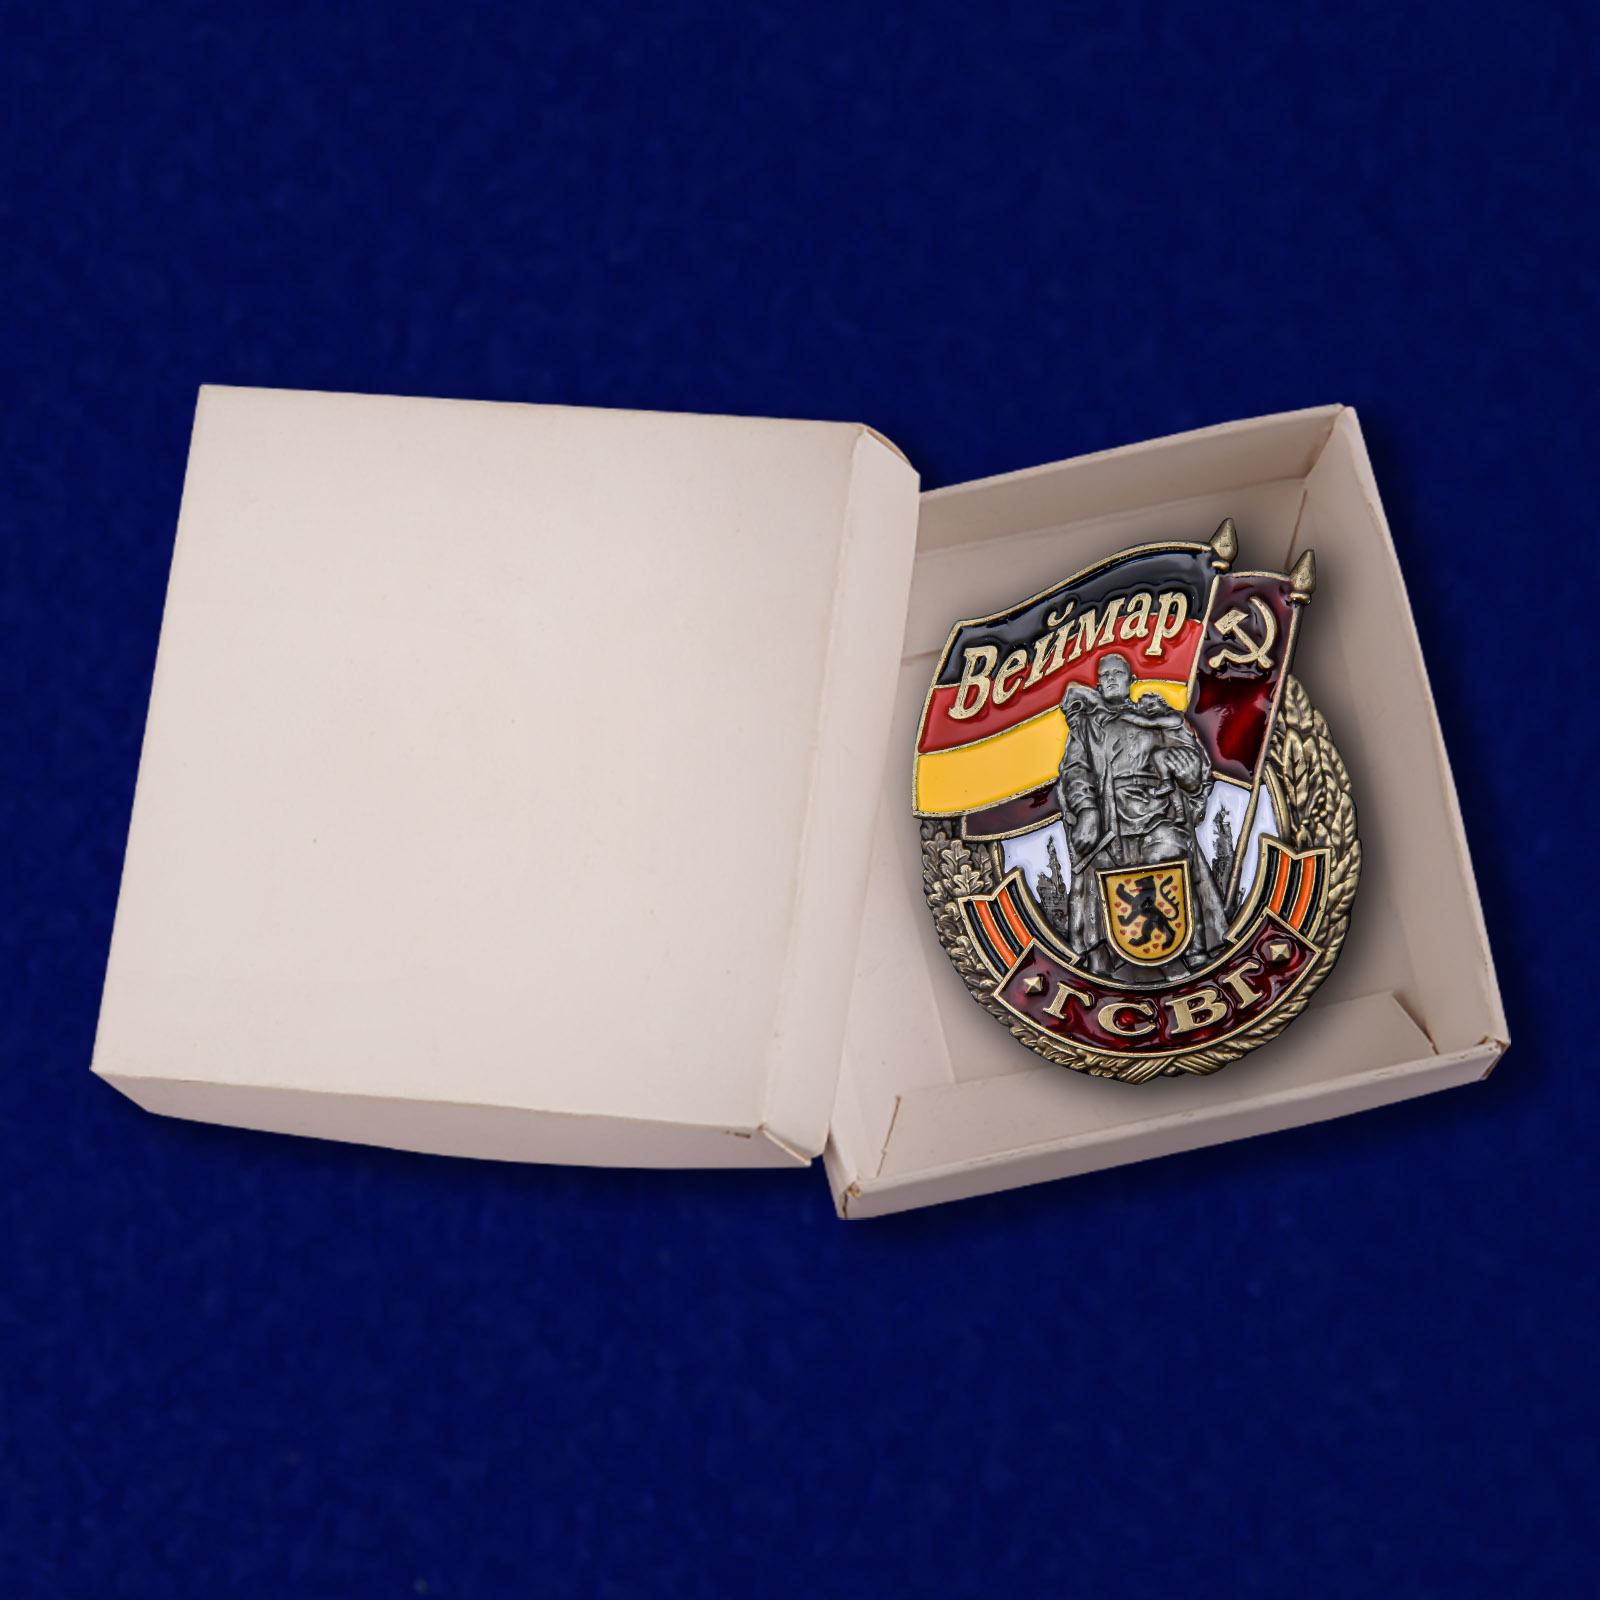 Знак ГСВГ Веймар - в коробке